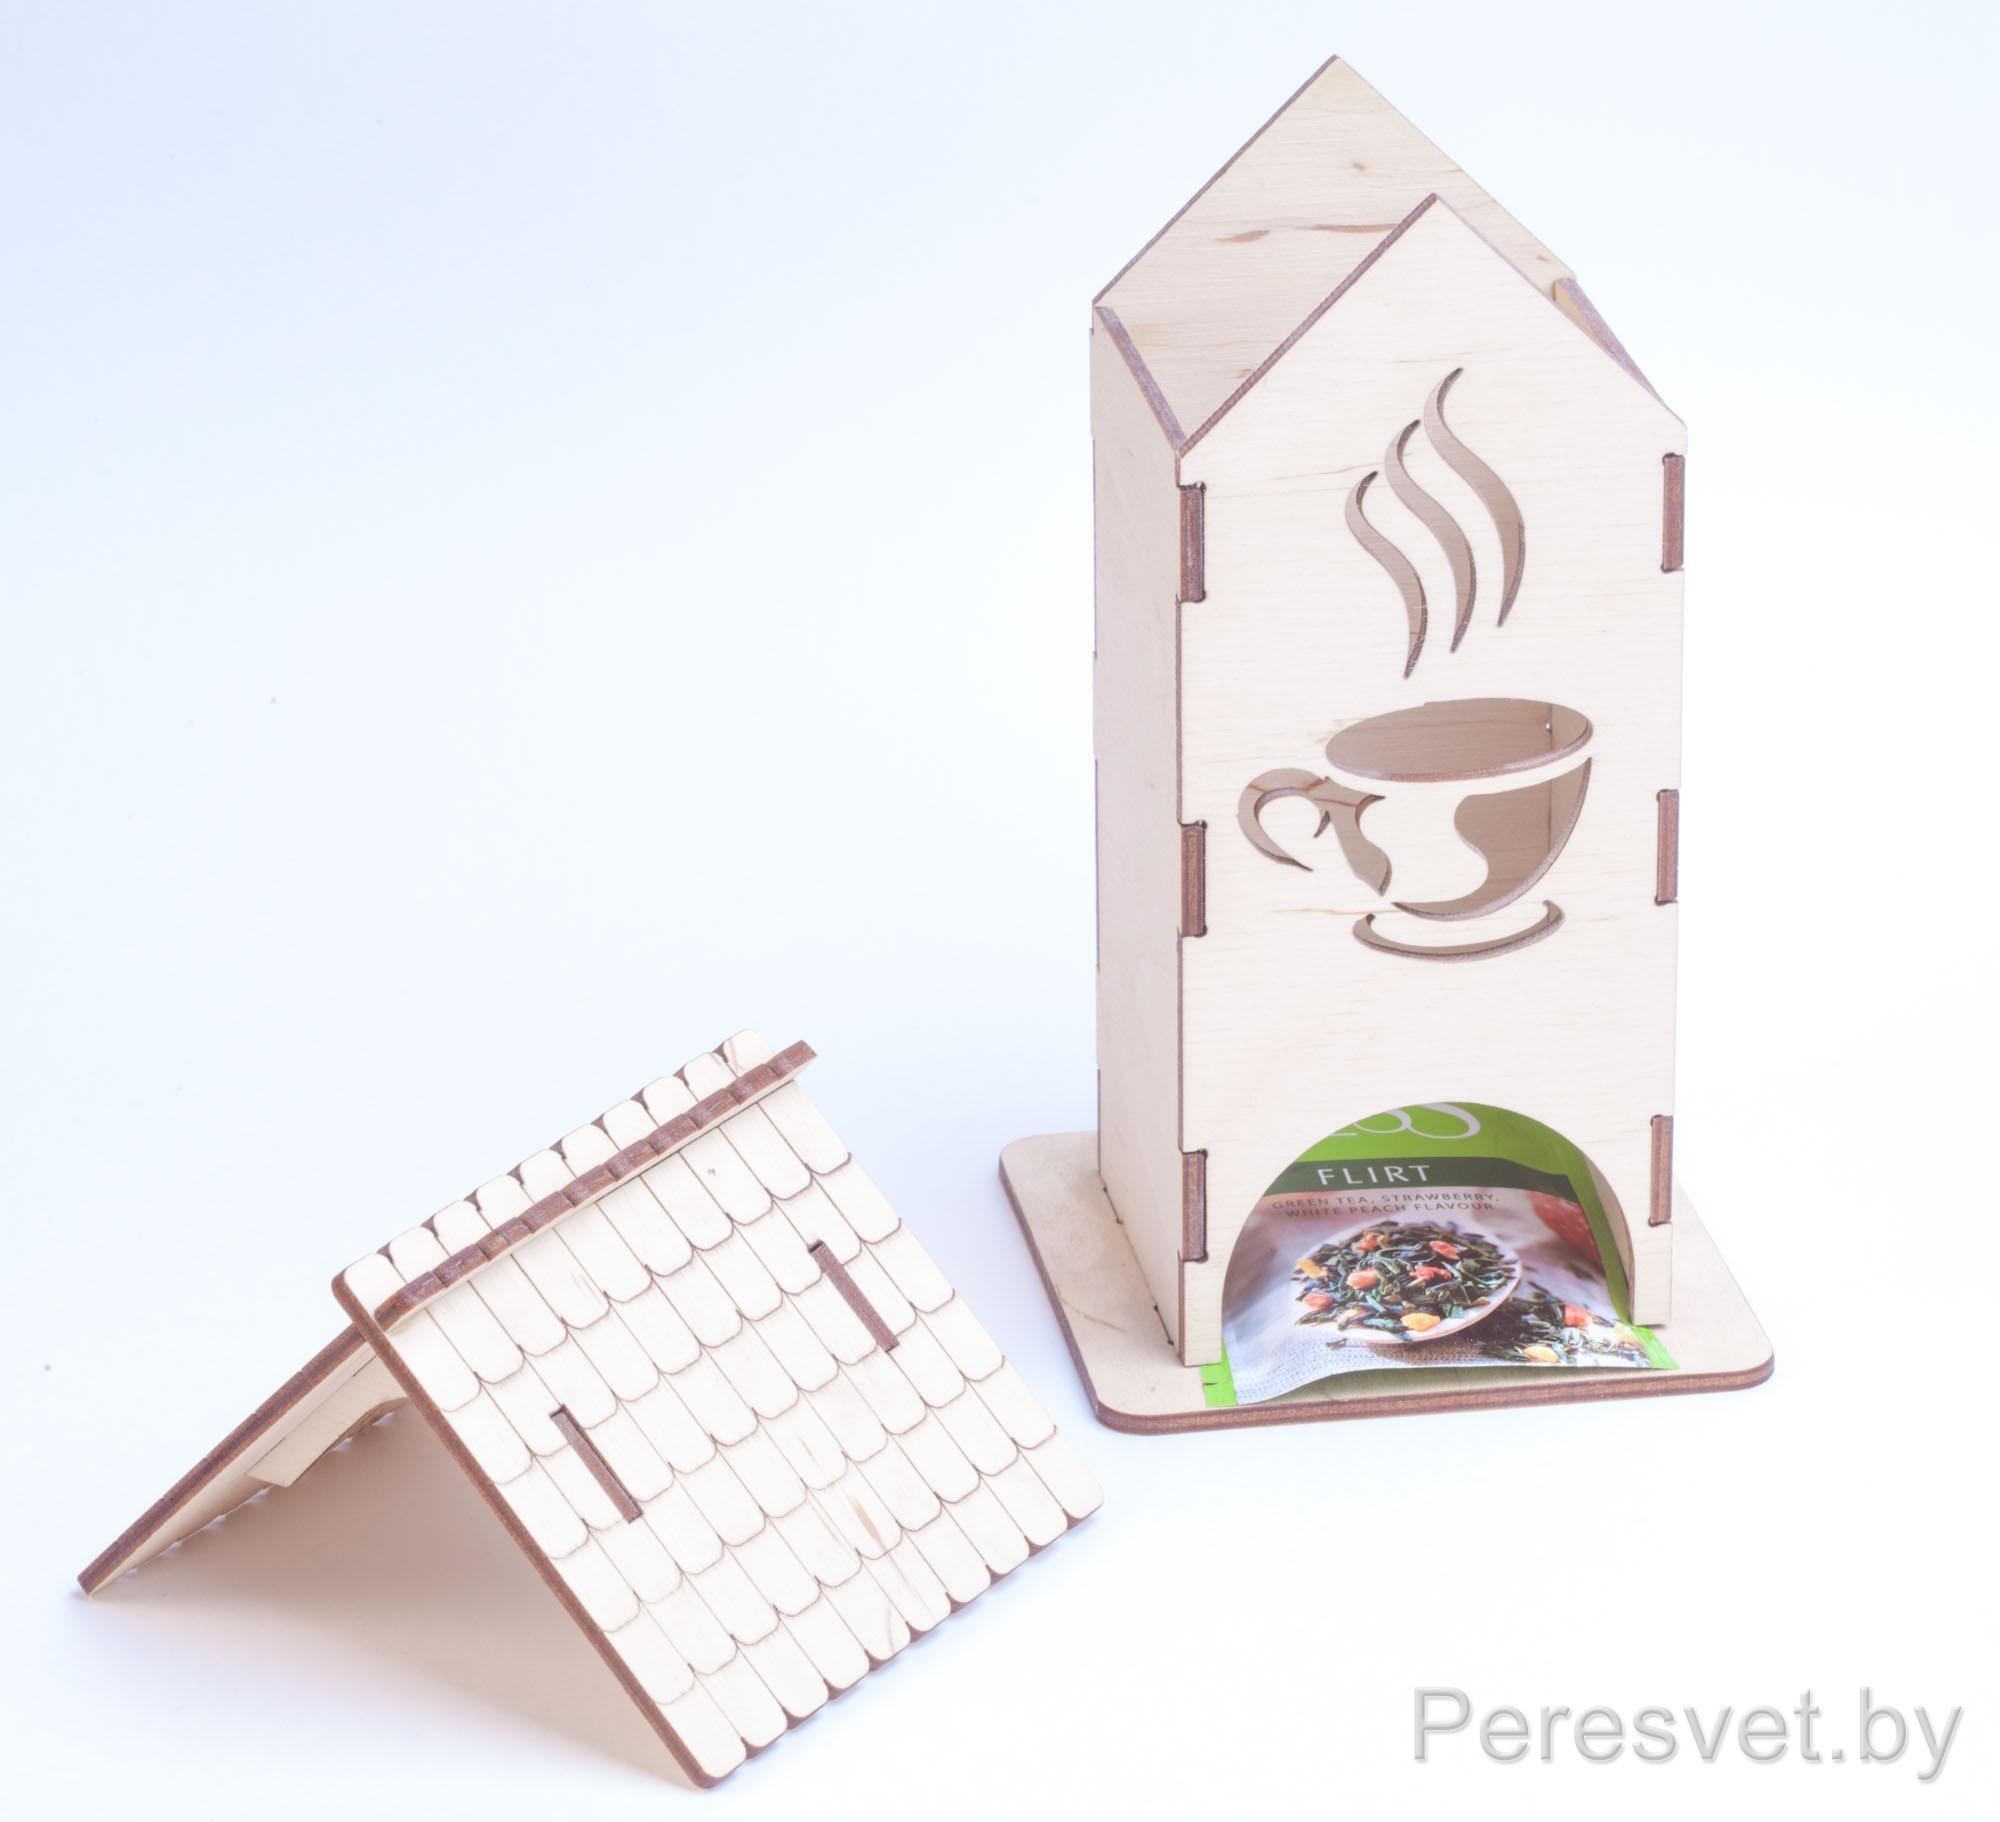 Чайный домик Субботний вечер на peresvet.by